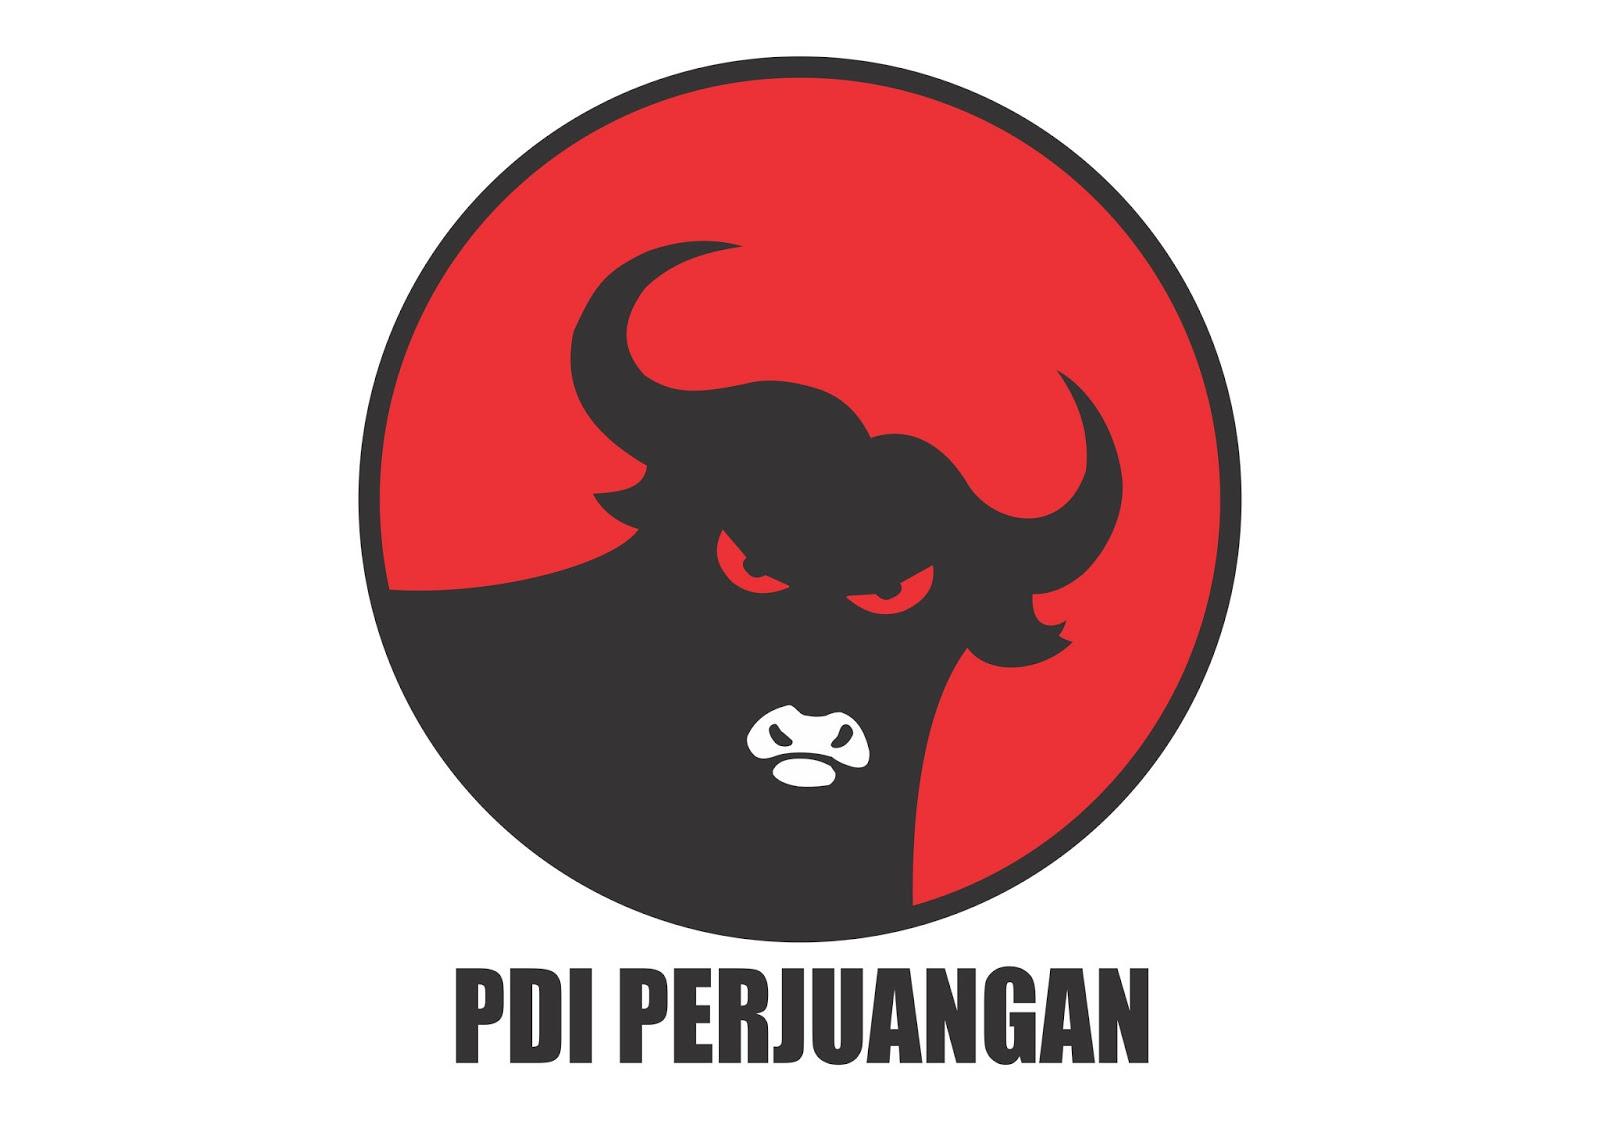 aryo widiantoko download logo vector partai politik parpol peserta pemilu 2014 aryo widiantoko blogger